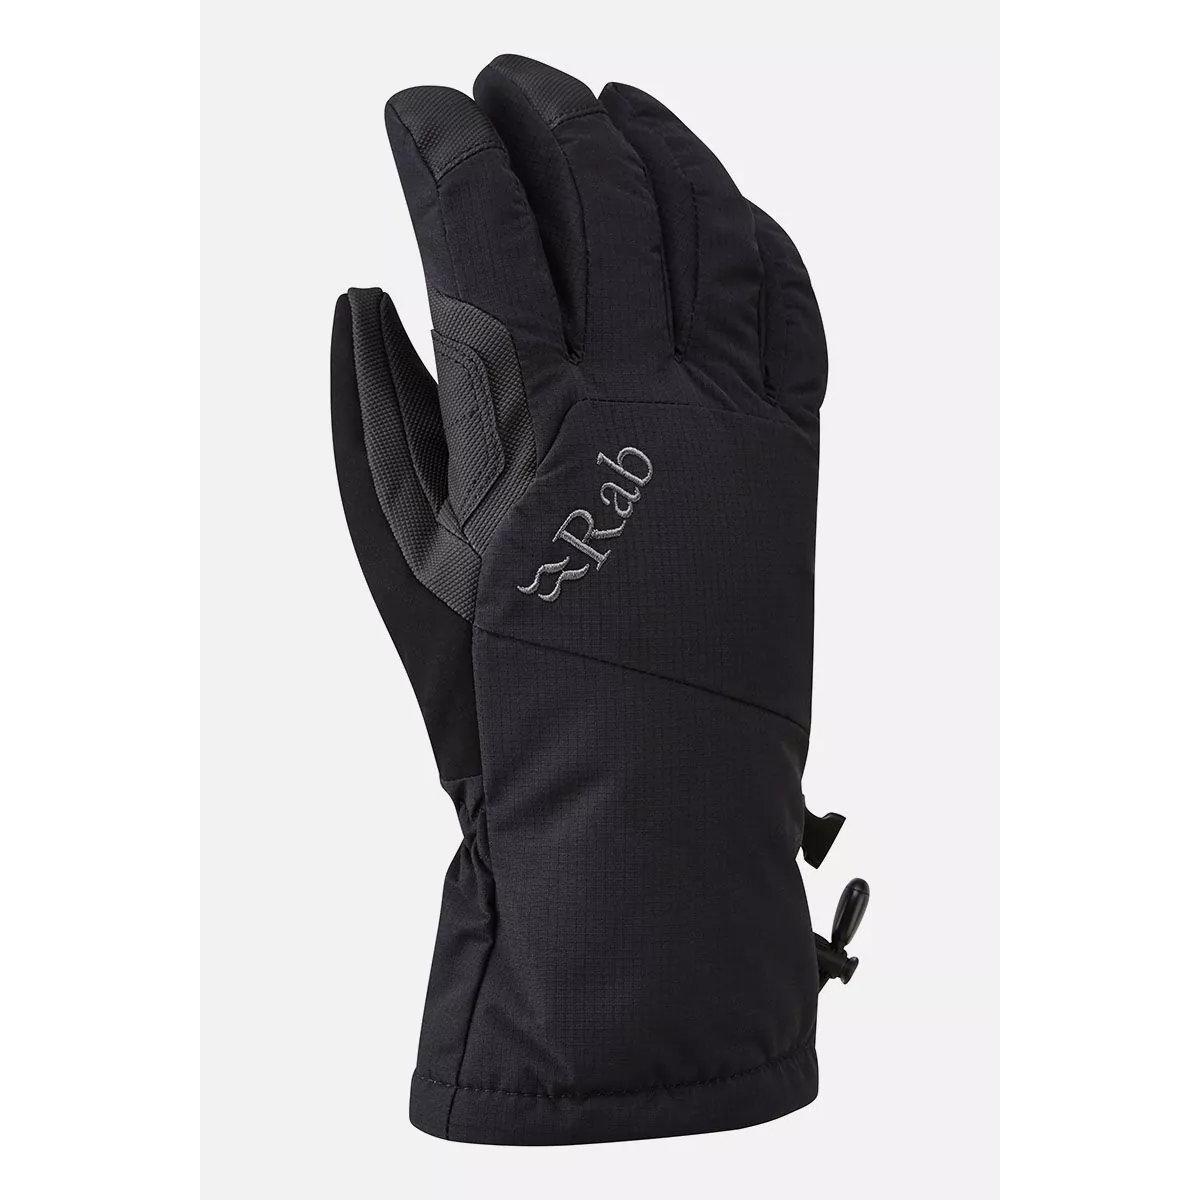 Rab Women's Rab Storm Glove - Black